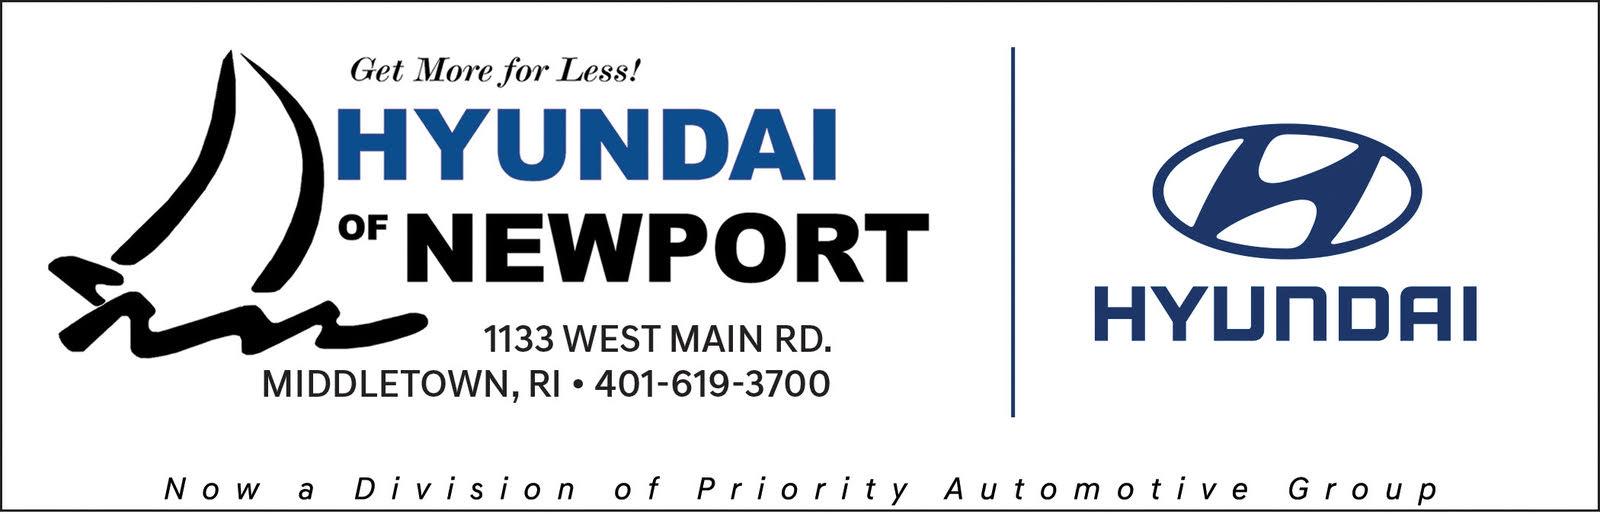 Hyundai Of Newport >> Hyundai Of Newport Middletown Ri Read Consumer Reviews Browse